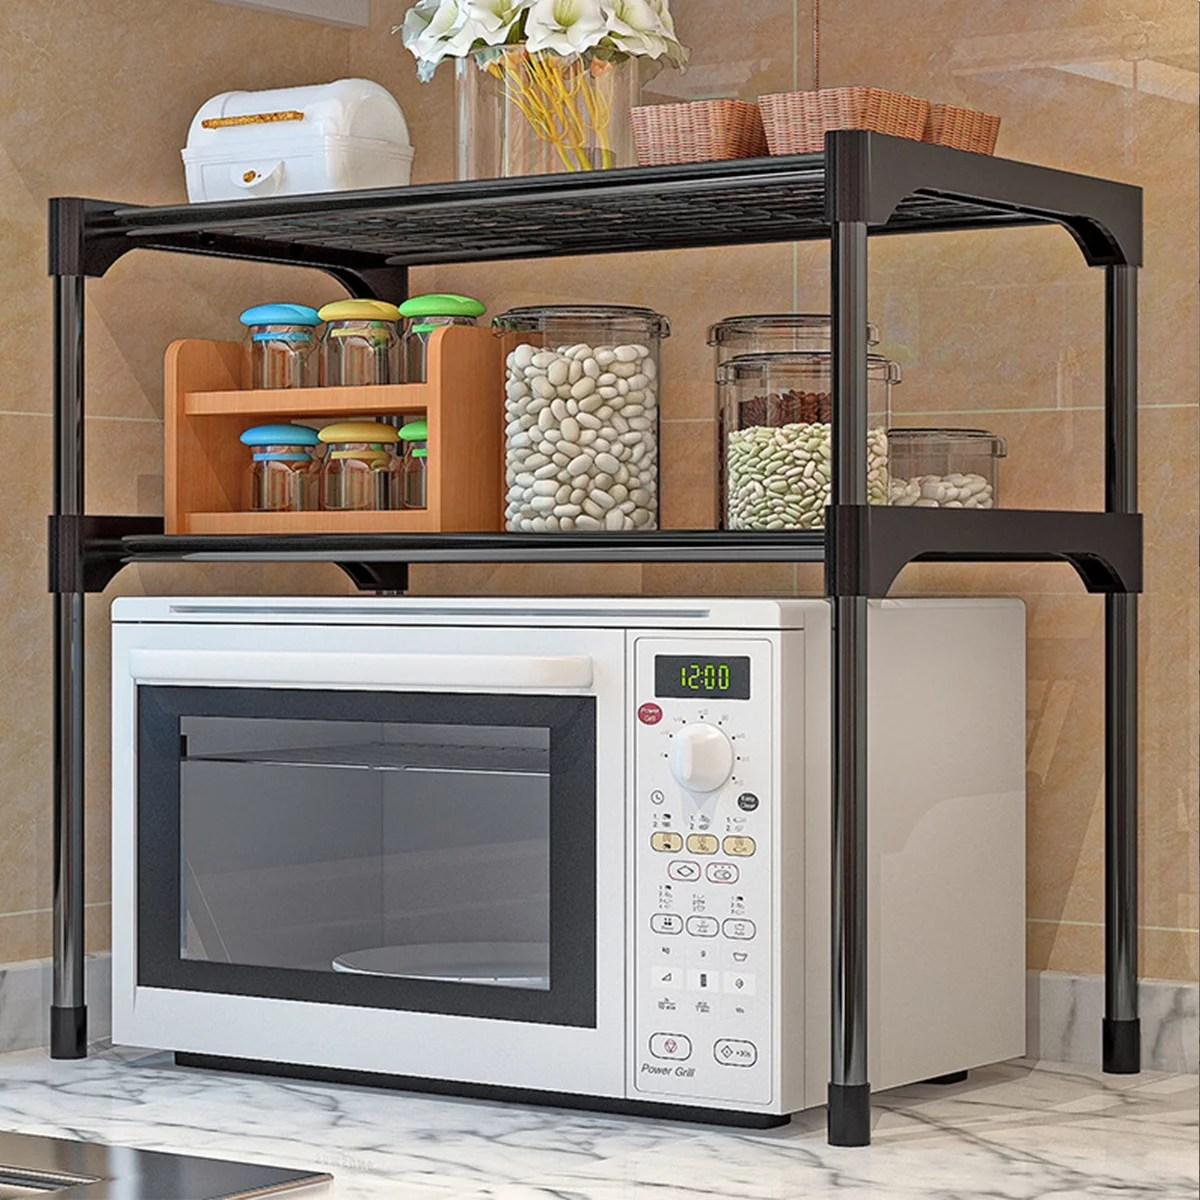 multifunction microwave oven rack shelf oven rack stainless steel kitchen rack storage shelf cabinet holder home kitchen rack 2 tiers